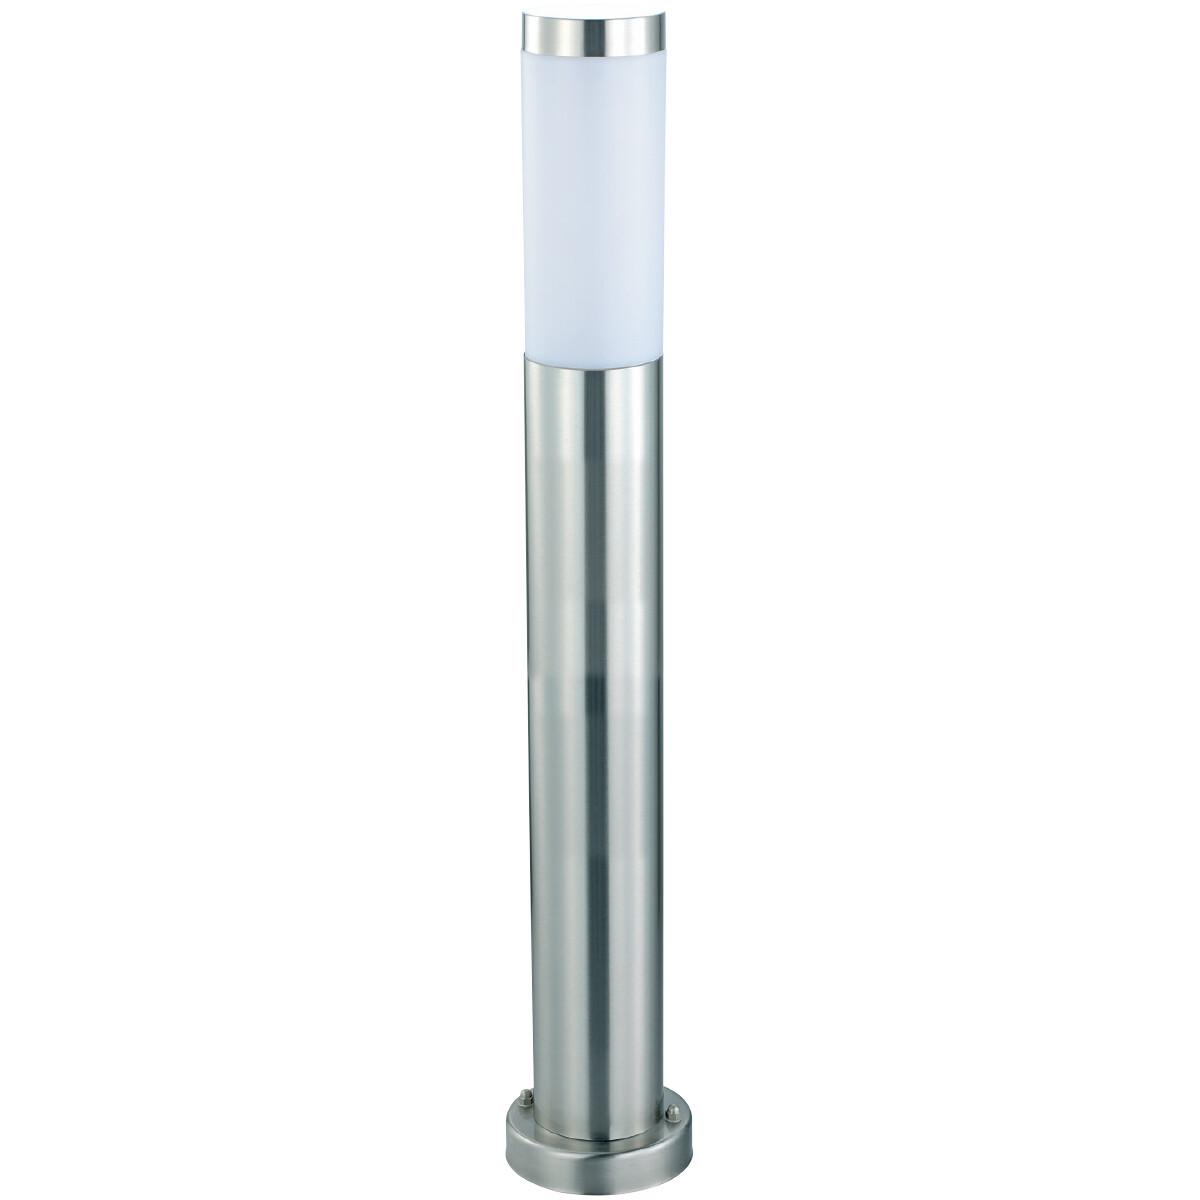 PHILIPS - LED Tuinverlichting - Staande Buitenlamp - CorePro Lustre 827 P45 FR - Laurea 5 - E27 Fitt